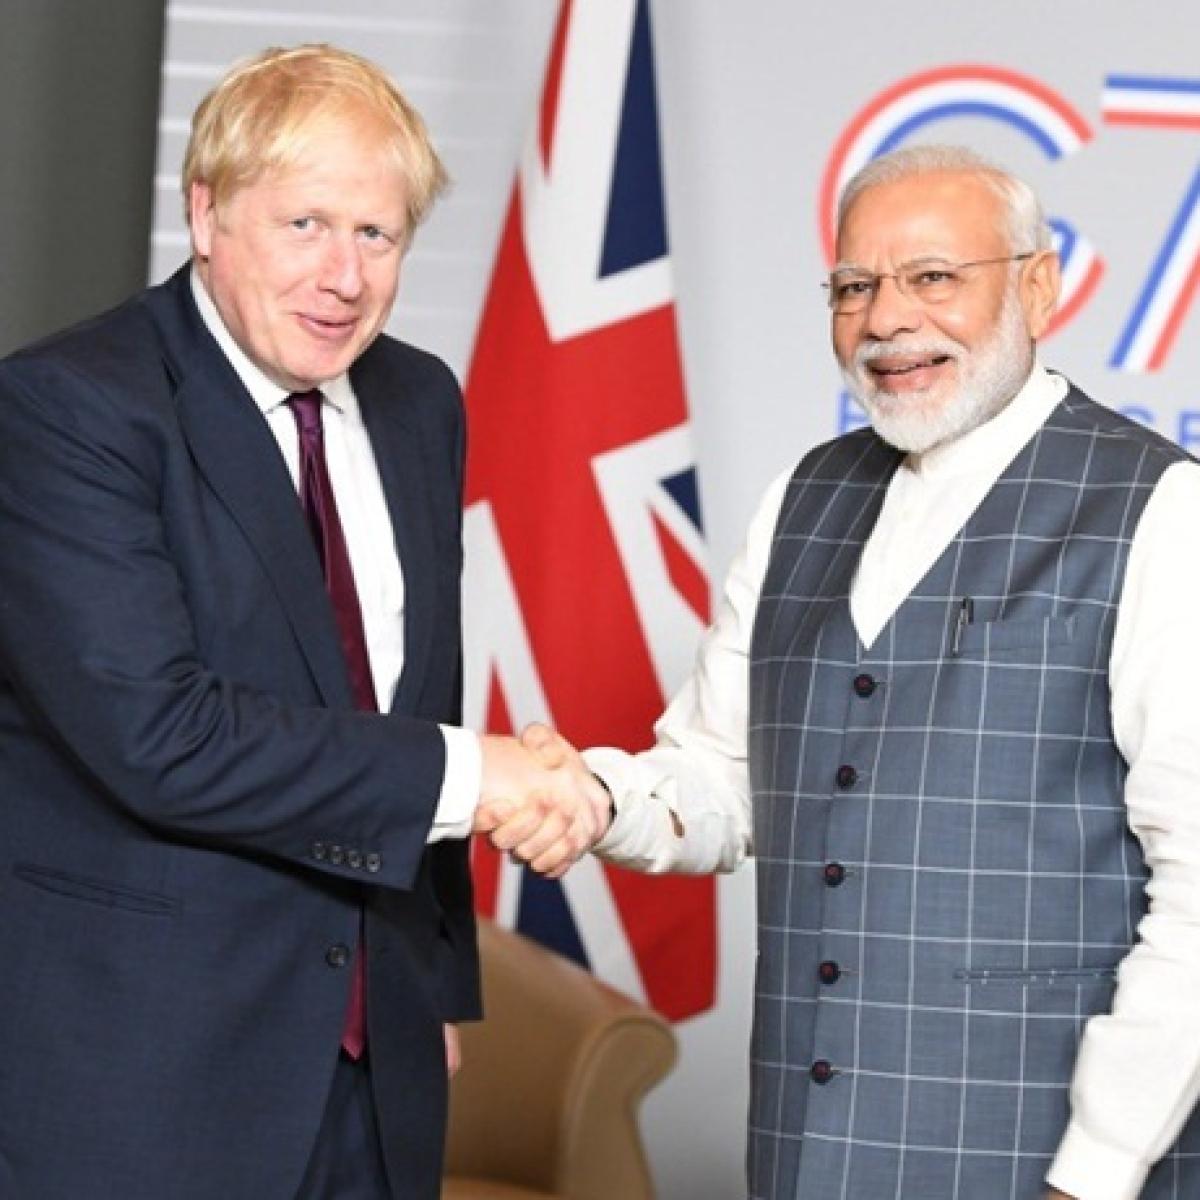 'Many congratulations': PM Modi wishes Boris Johnson on 'thumping majority' in UK election